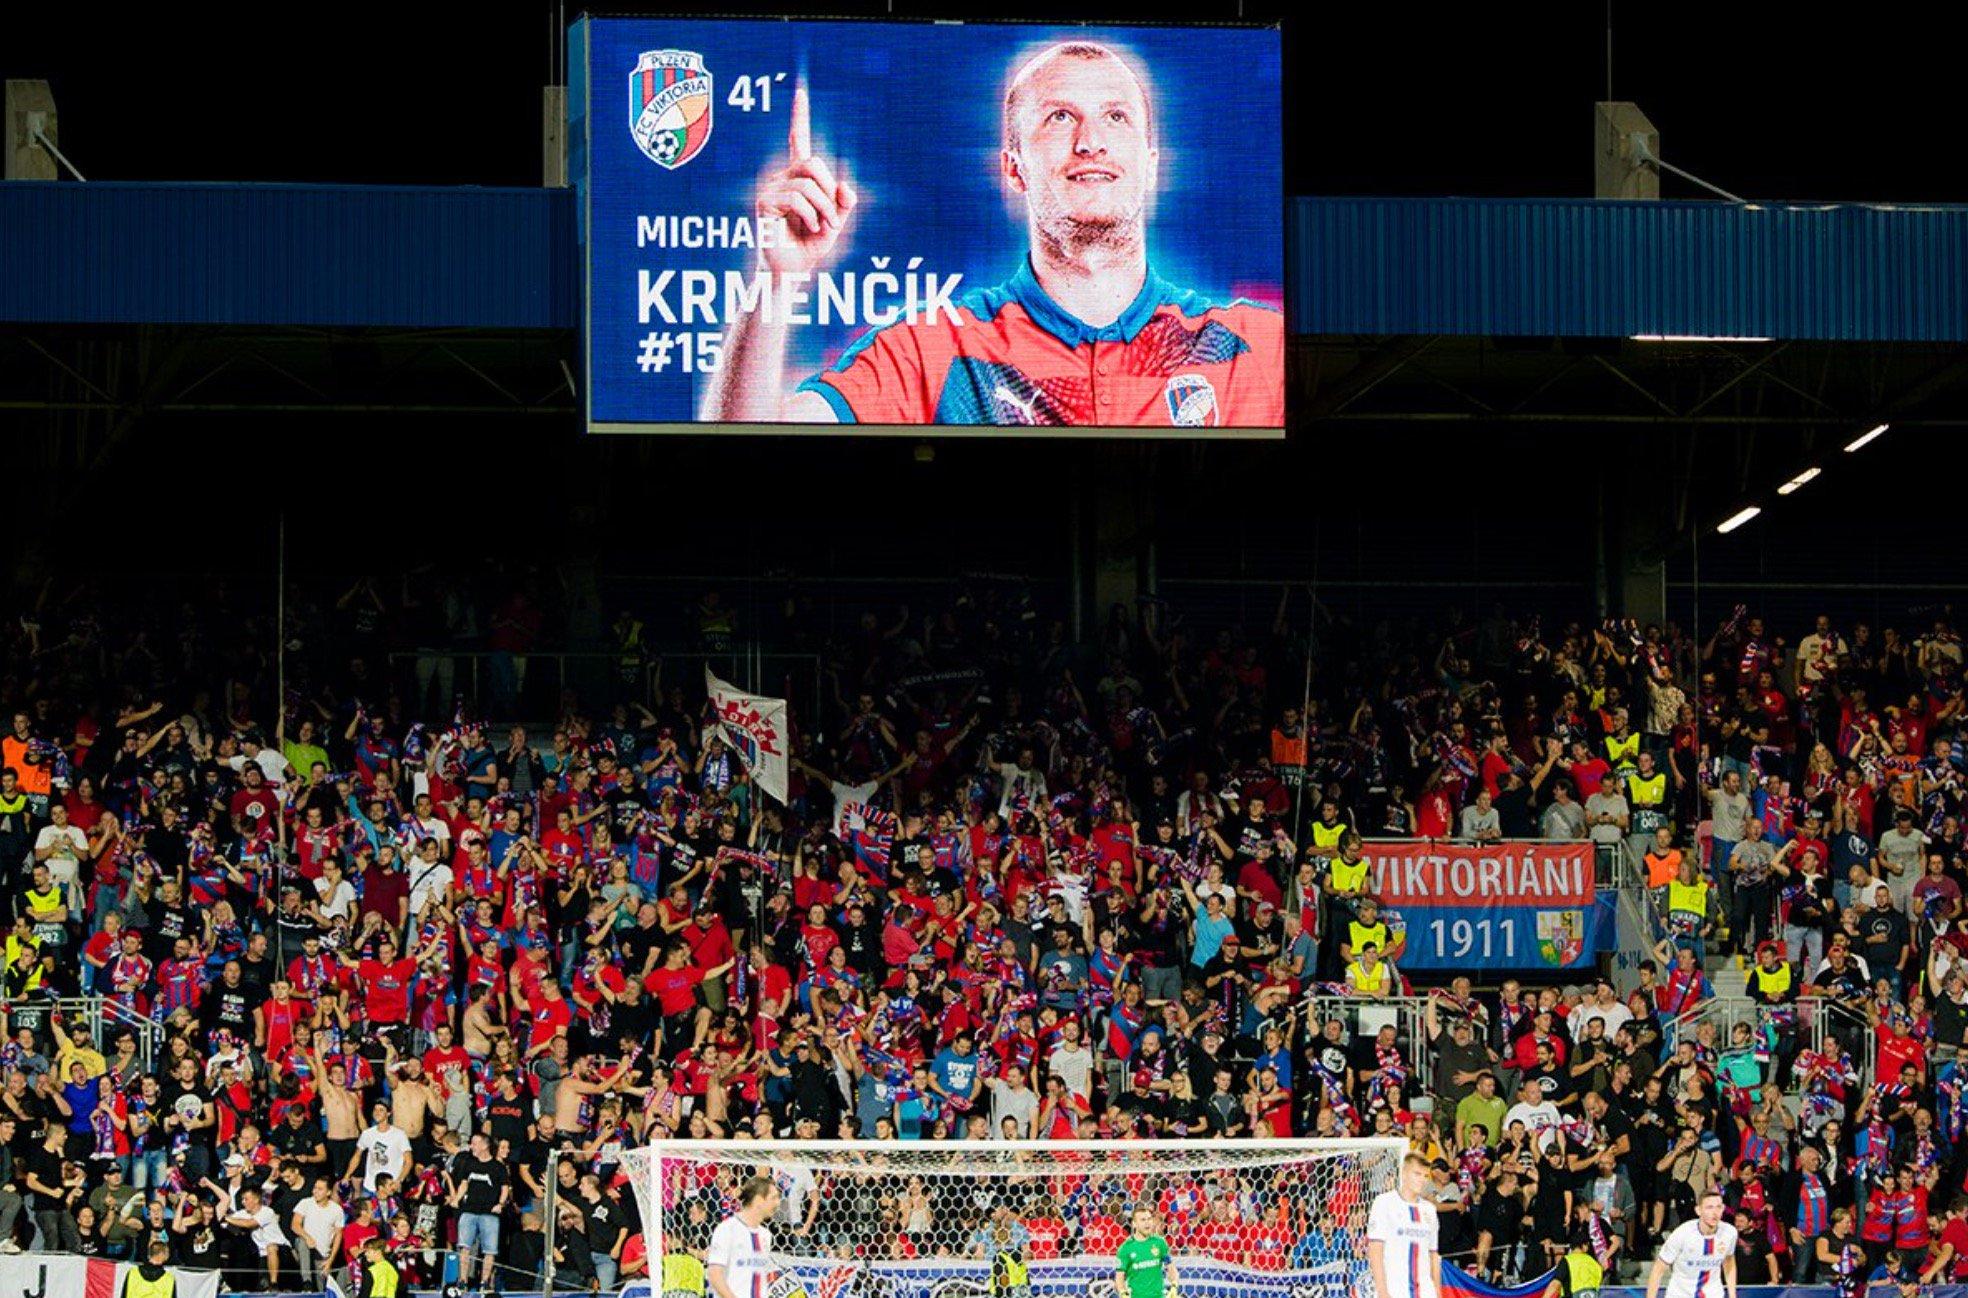 Krmencik Champions Roma Plzen